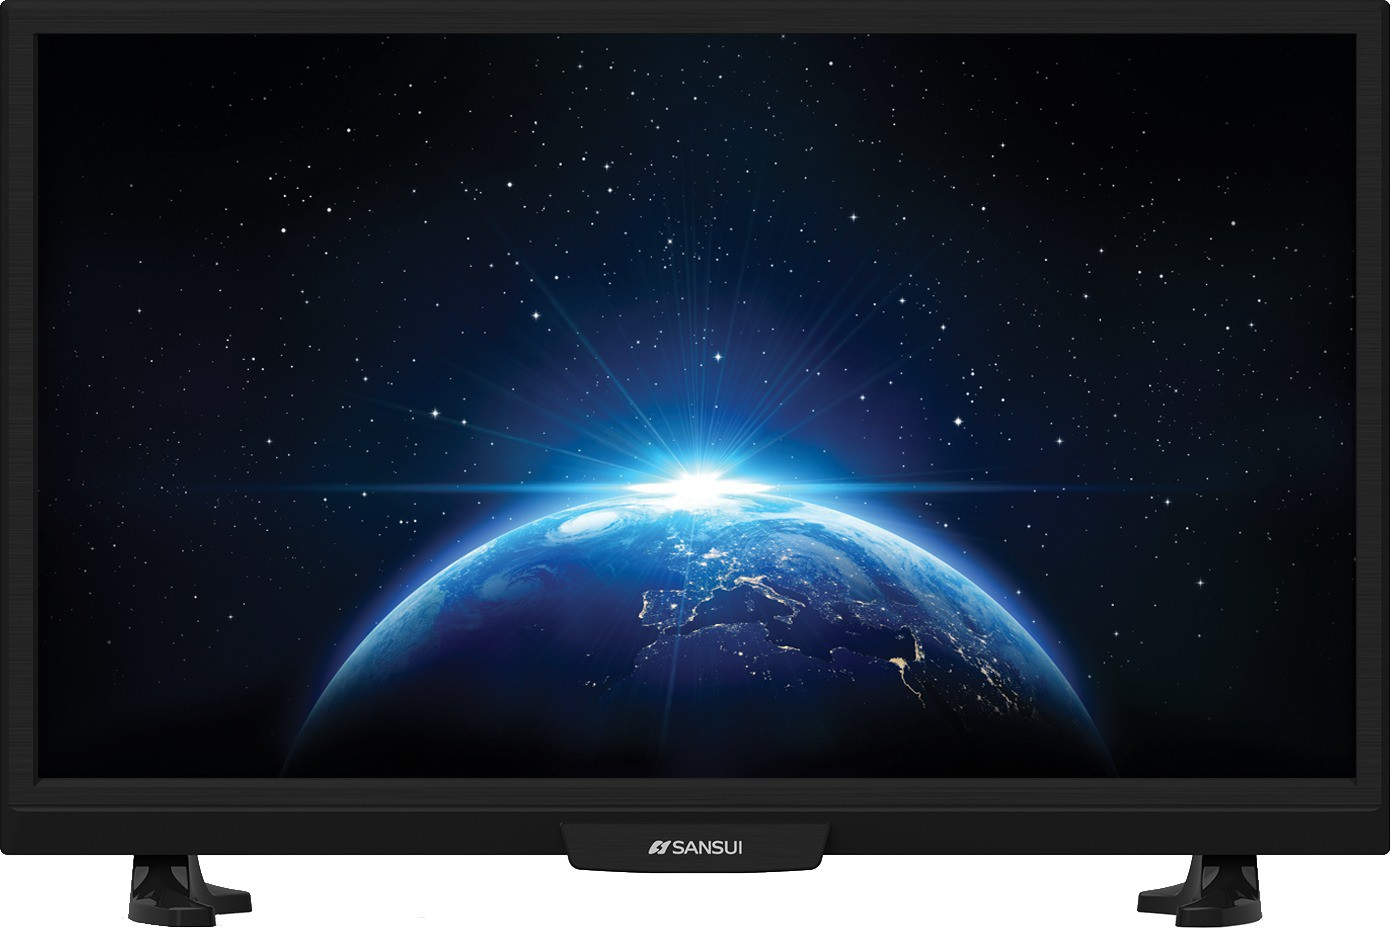 SANSUI SMC40FB17XAF 39 Inches Full HD LED TV